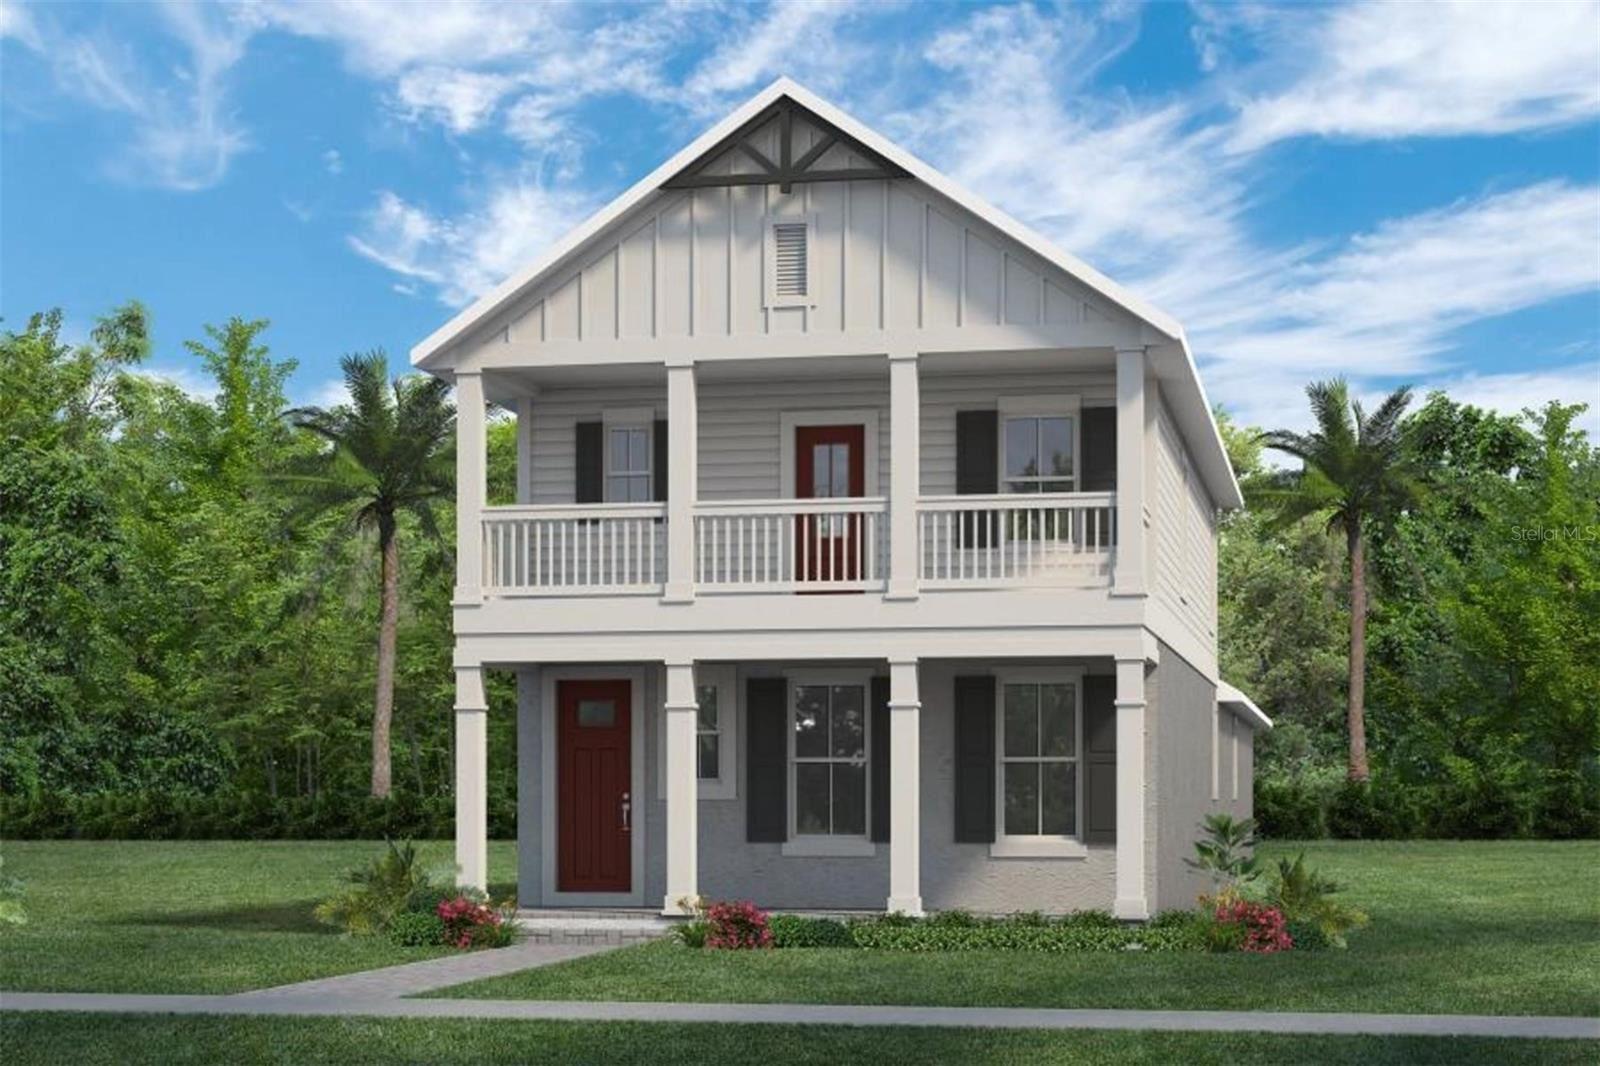 15306 LEBEAU LOOP, Winter Garden, FL 34787 - #: O5971720